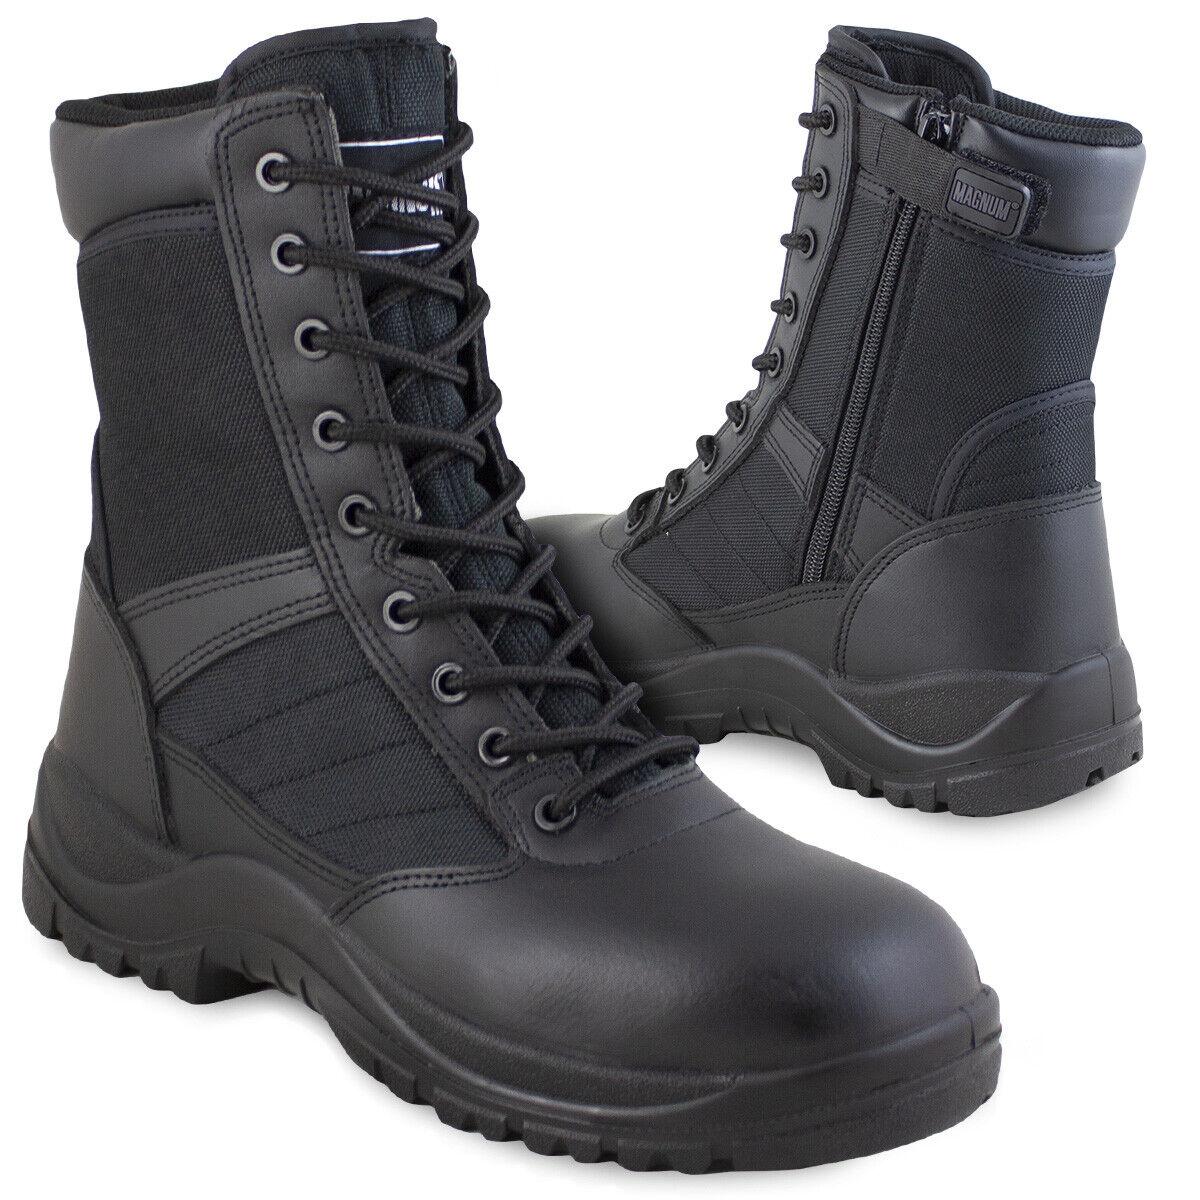 3a9e29a3 Magnum Centurion 8.0 Side-Zip Police Security Tactical Cadet Work Boots  Black